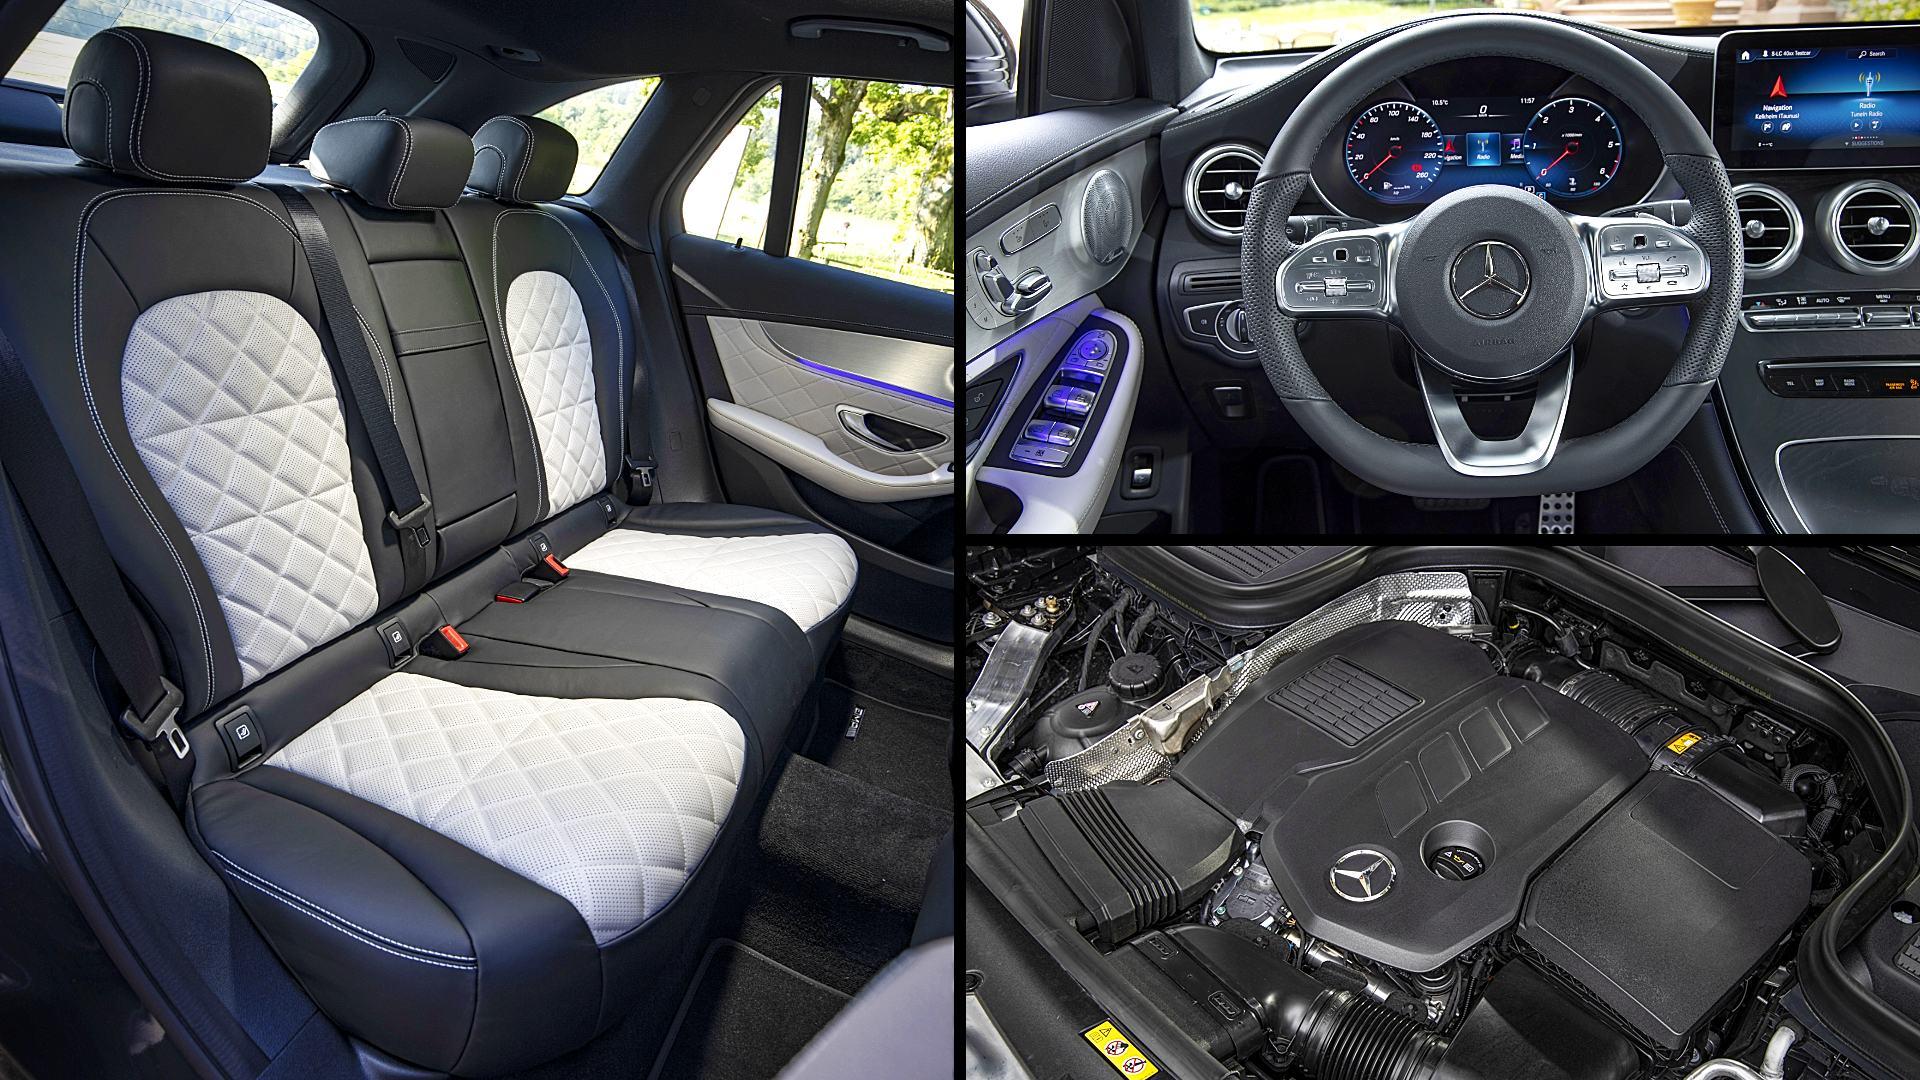 2020 Mercedes GLC 300 AMG SUV Interior